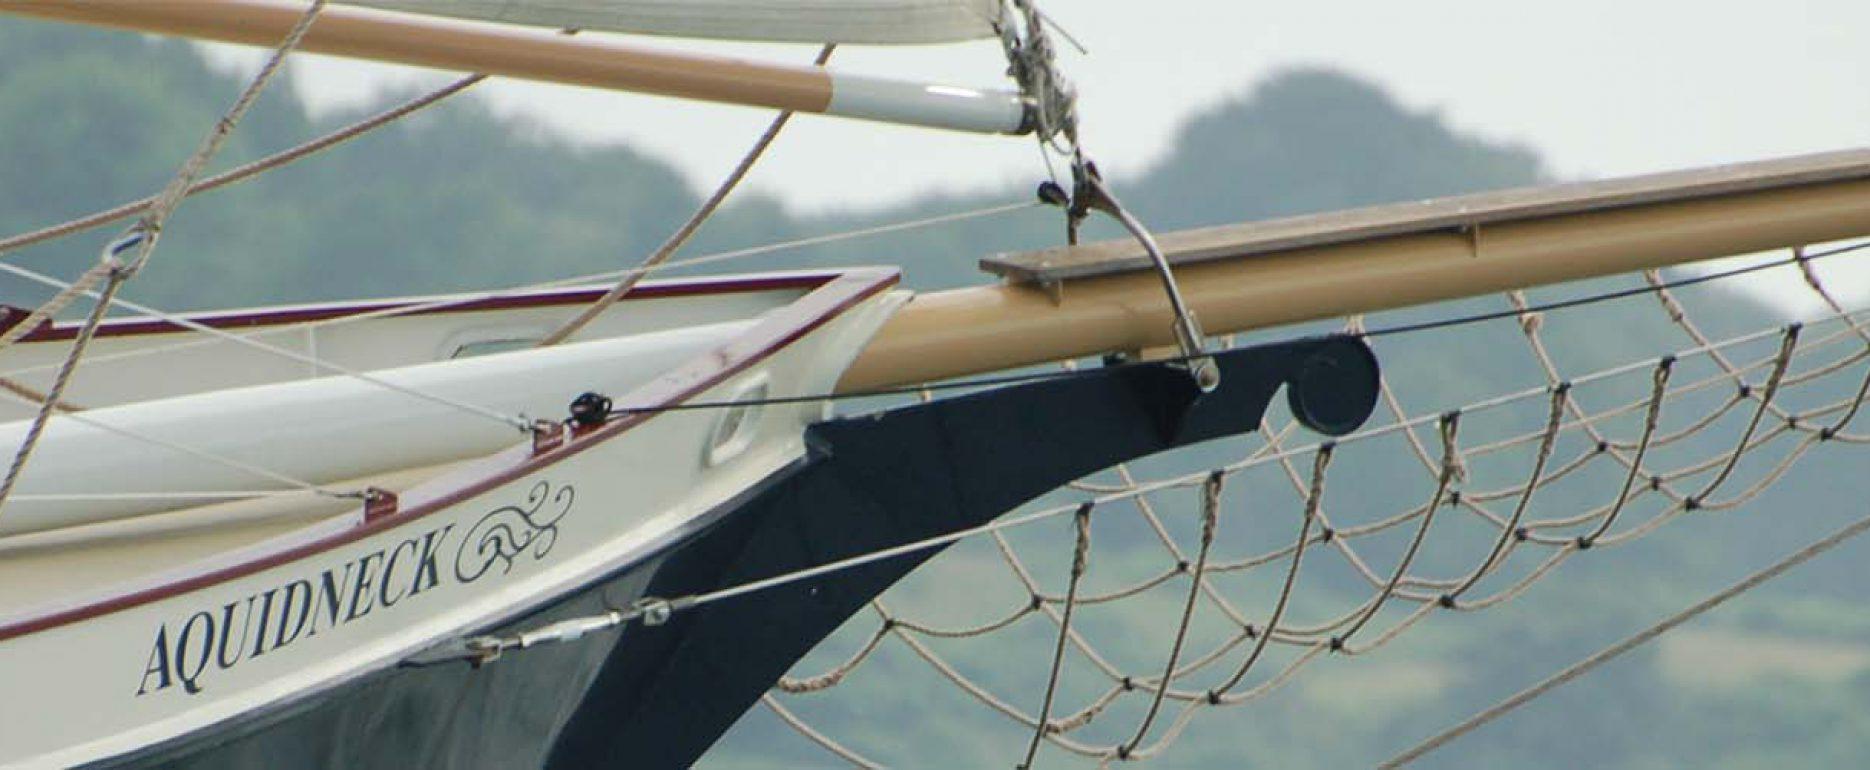 Special Sails